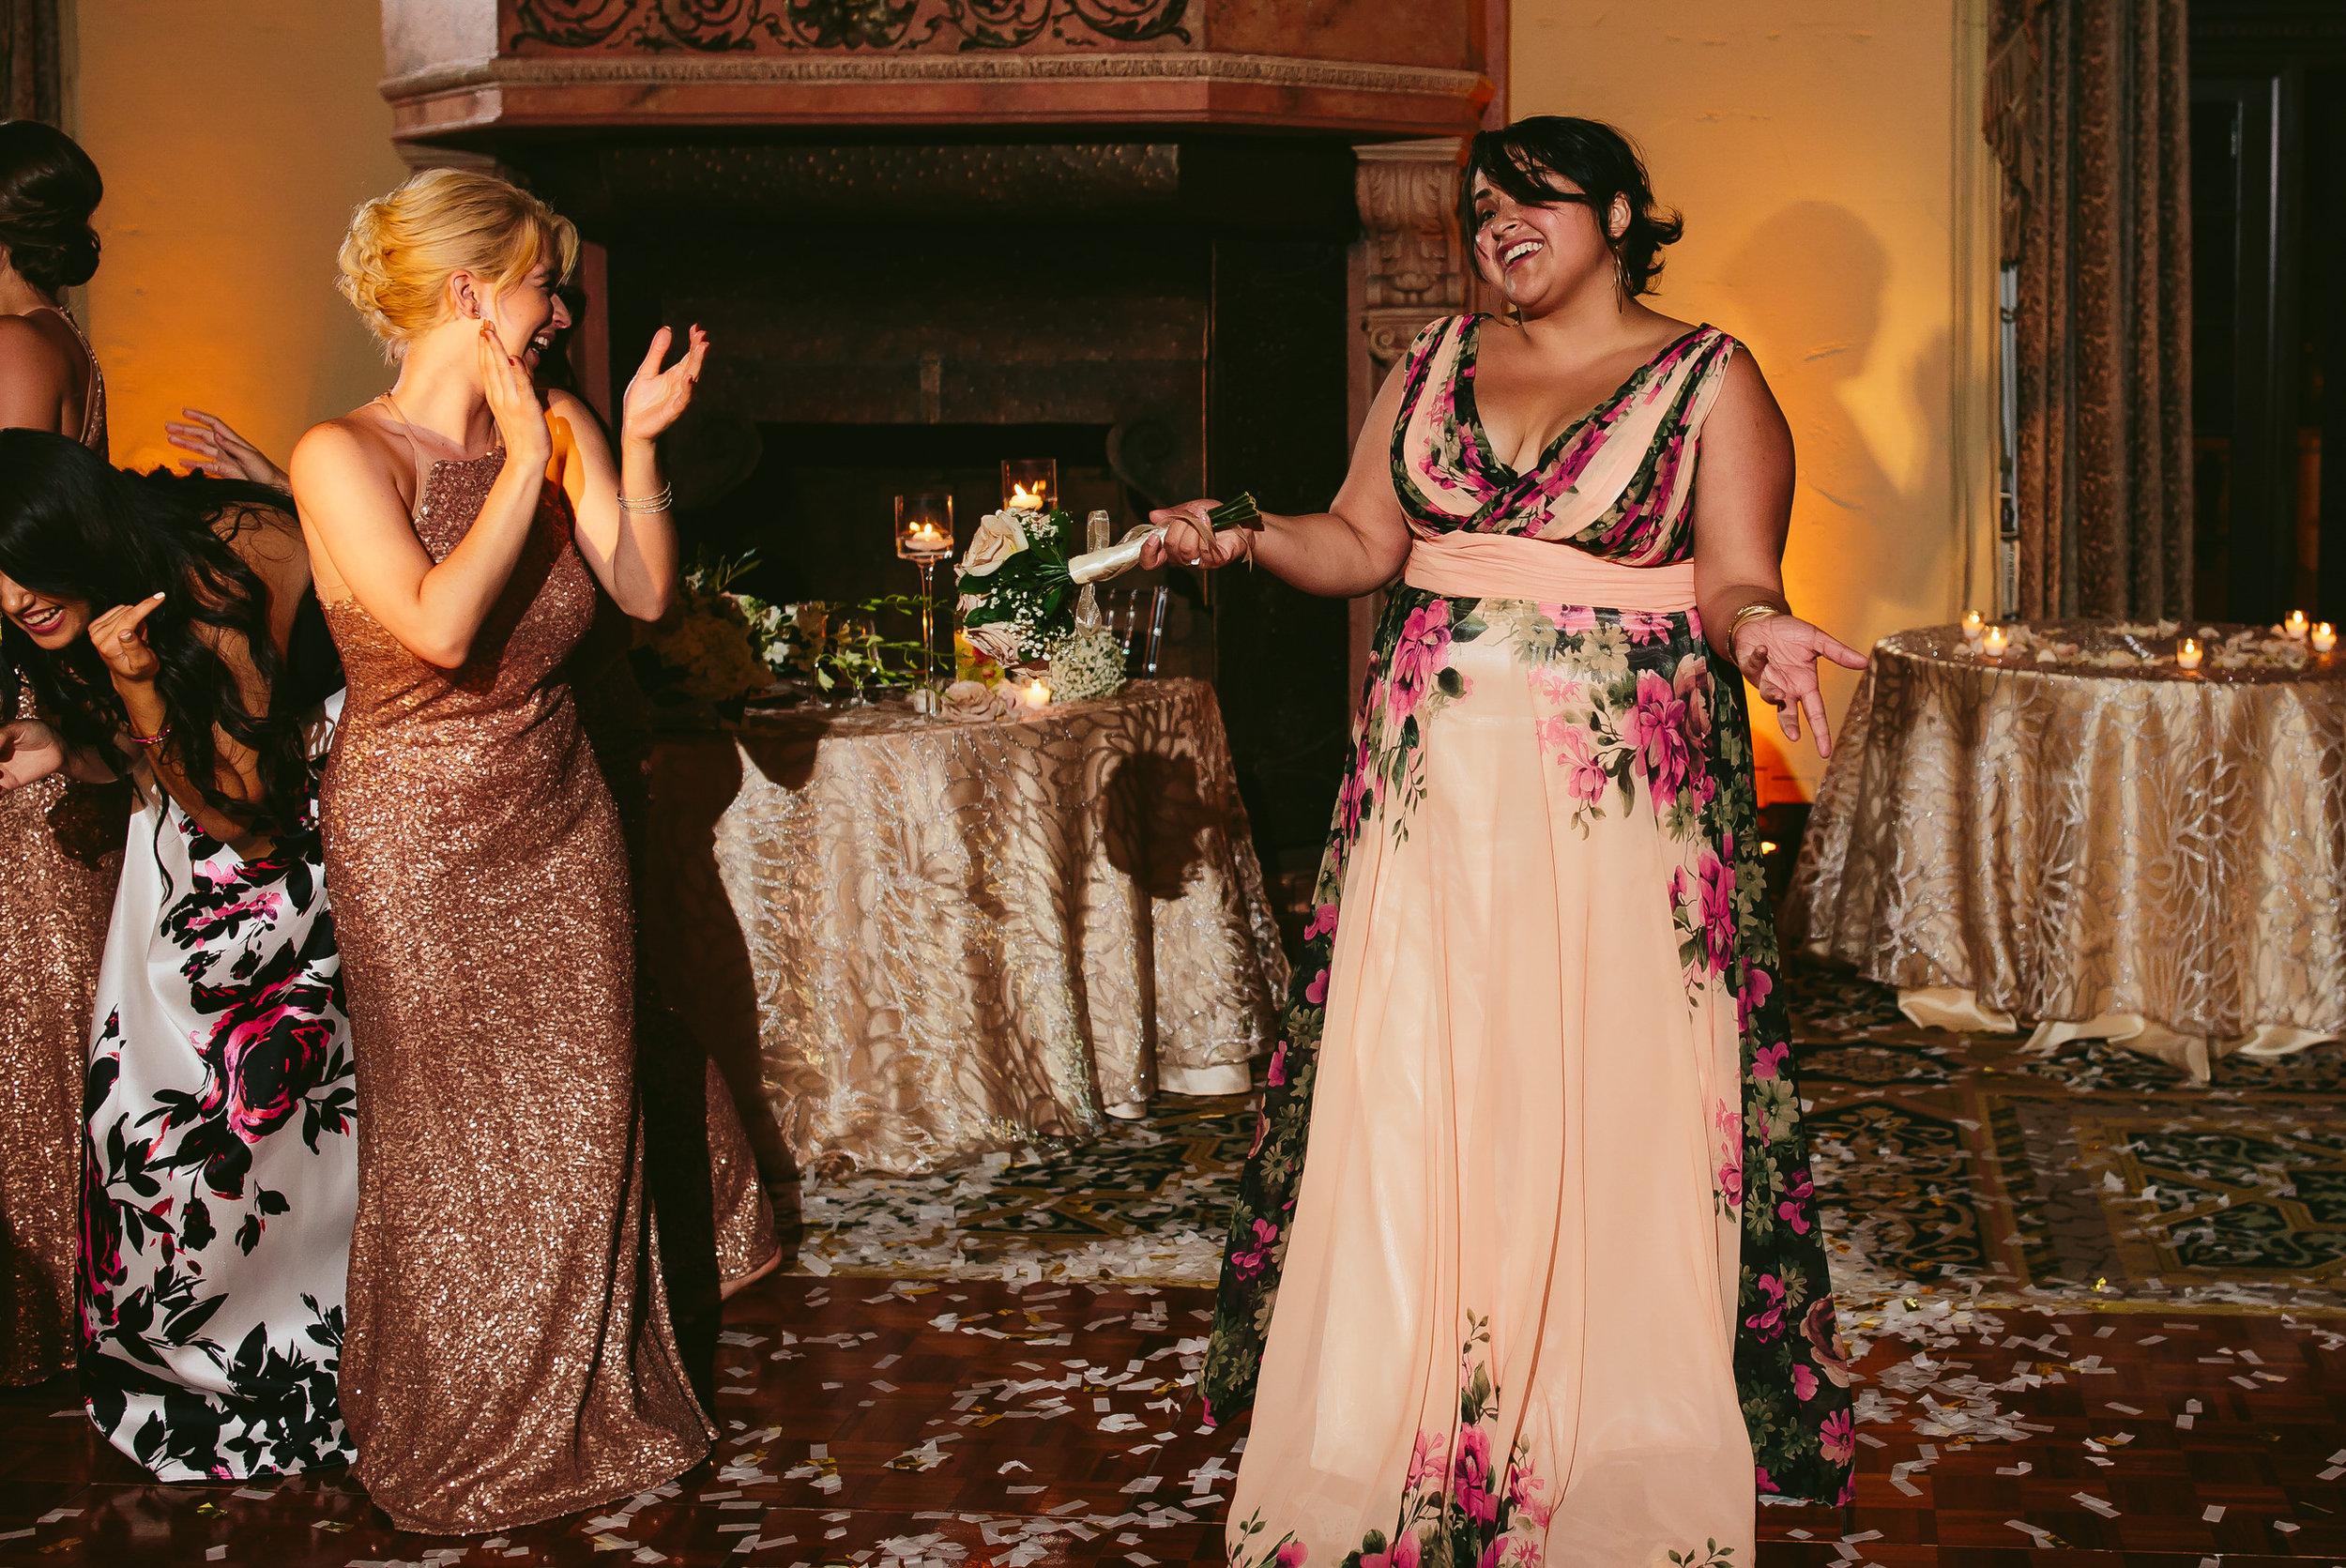 miami-biltmore-wedding-photographer-reception-party-37.jpg